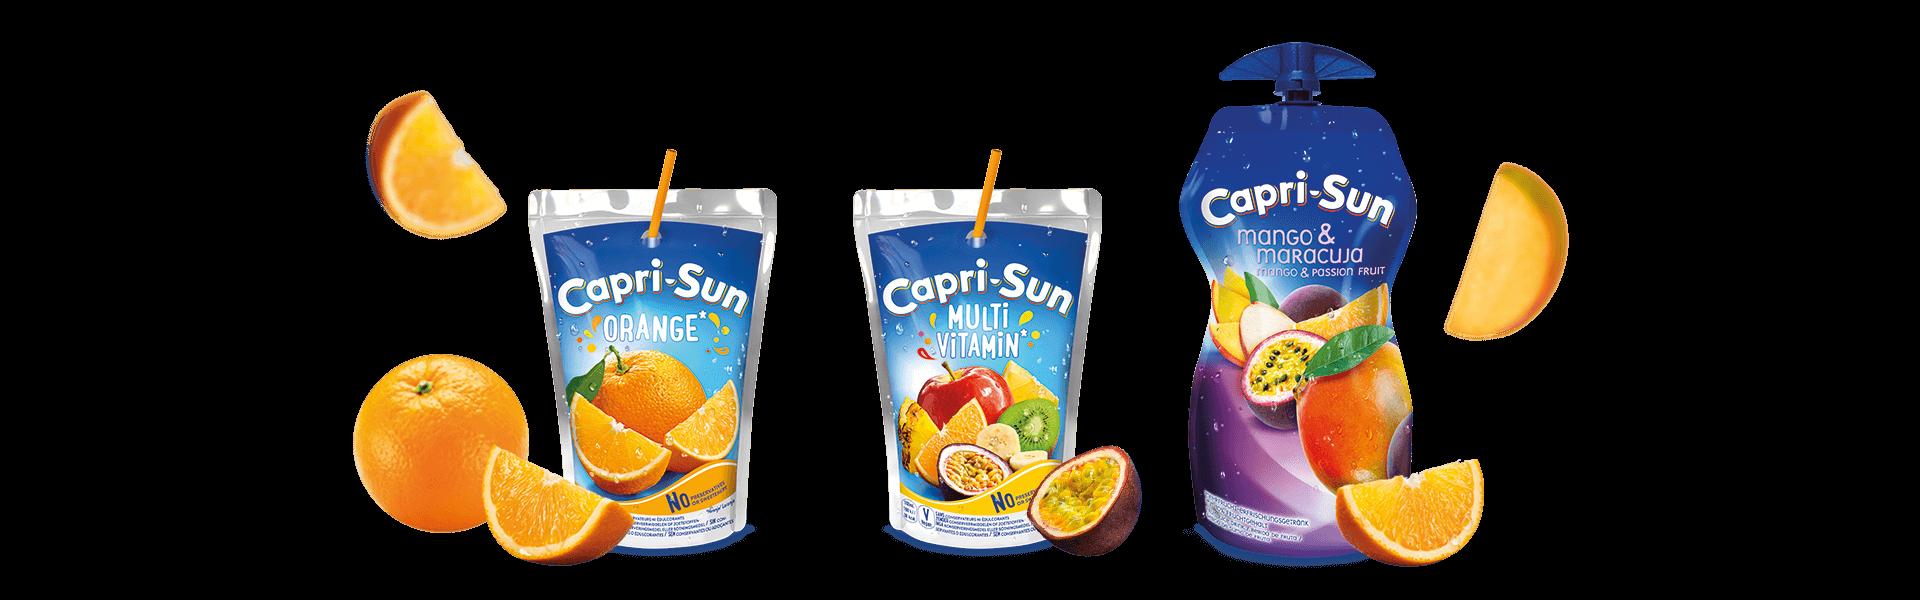 Capri Sun Orange 200ml Multivitamin 200ml and Mango Maracuja 330ml with flying fruits